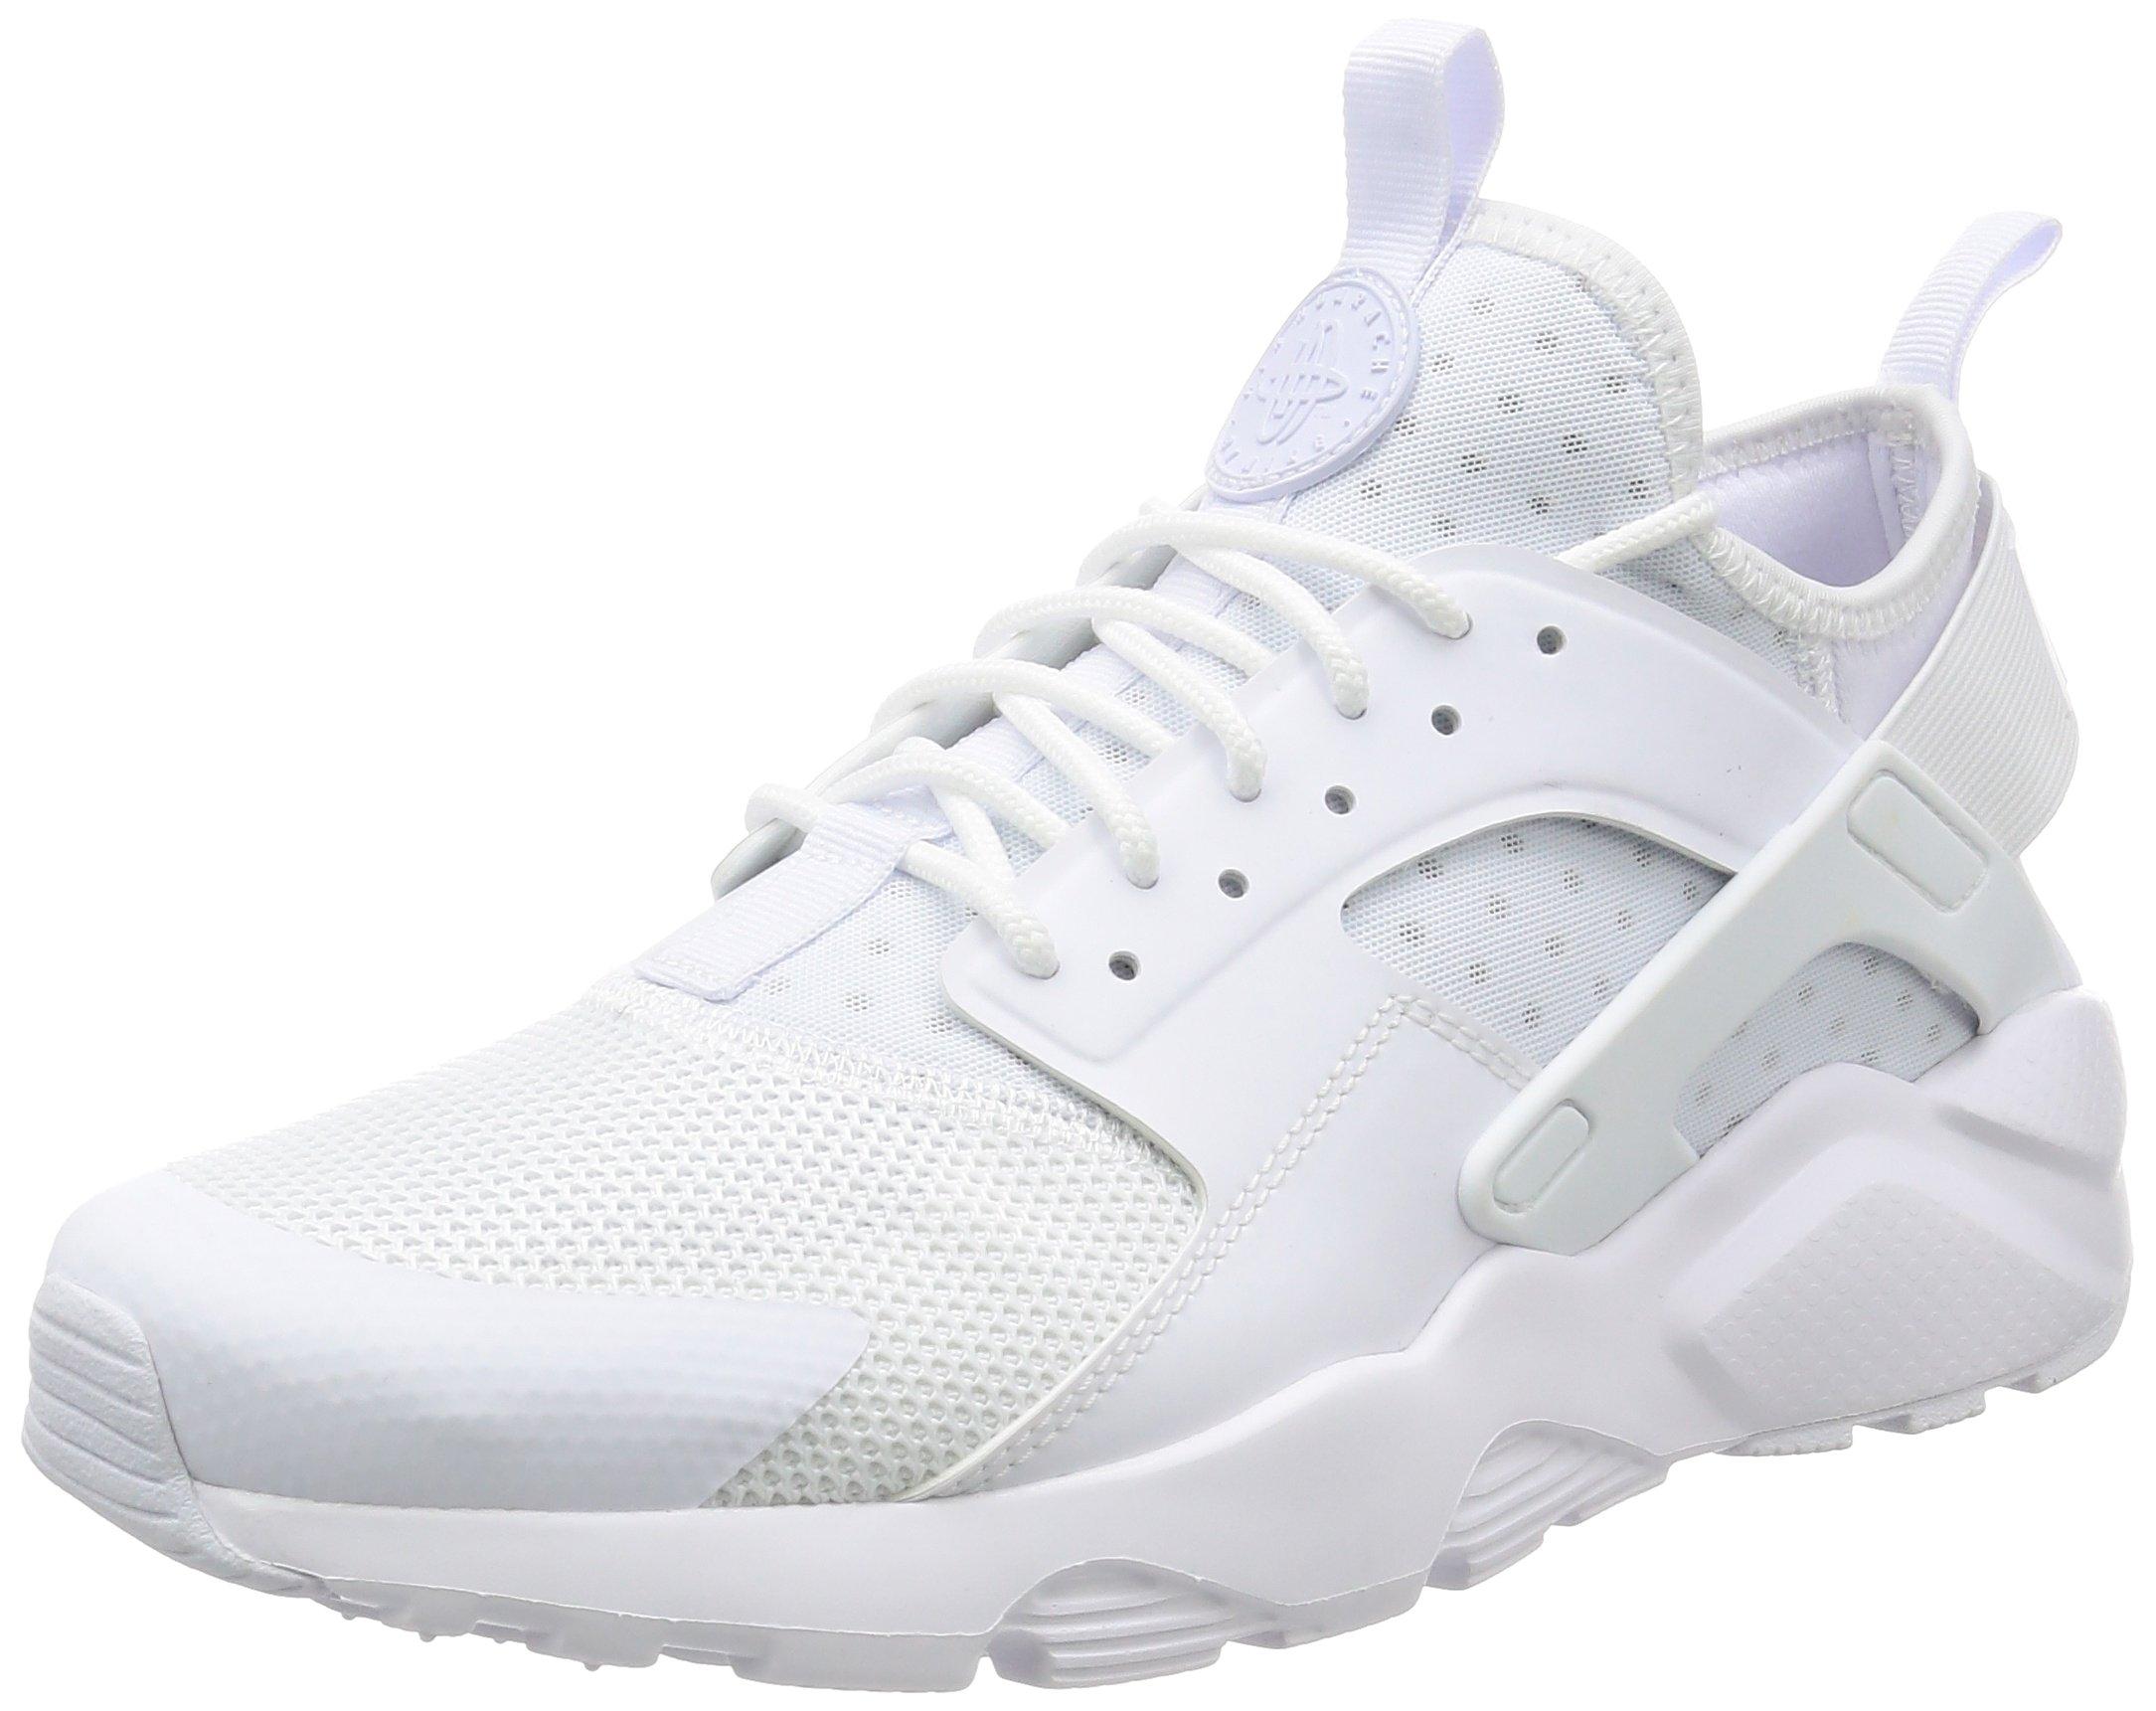 97559c98aeec9 Galleon - Nike Mens Huarache Run Ultra Running Shoes White White 819685-101  Size 11